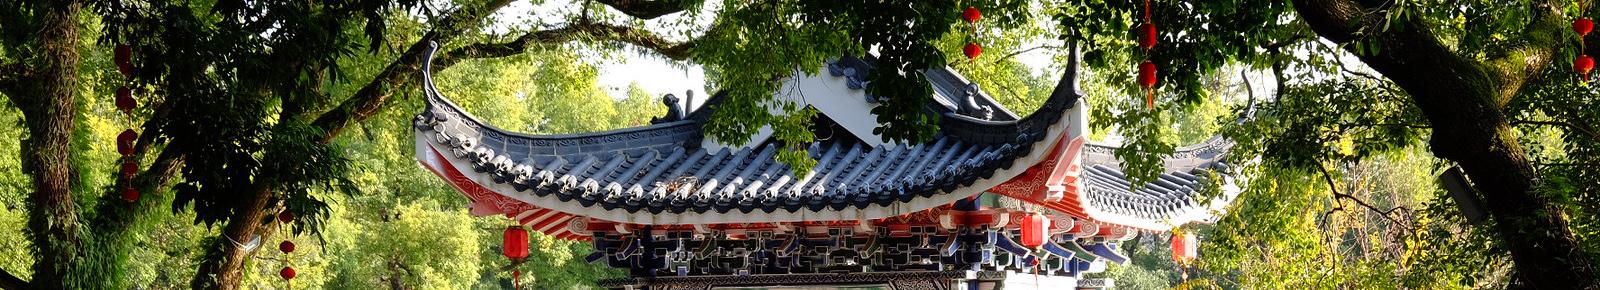 Страна драконов <br>   Пекин — Сиань — Гуйлинь — Шанхай